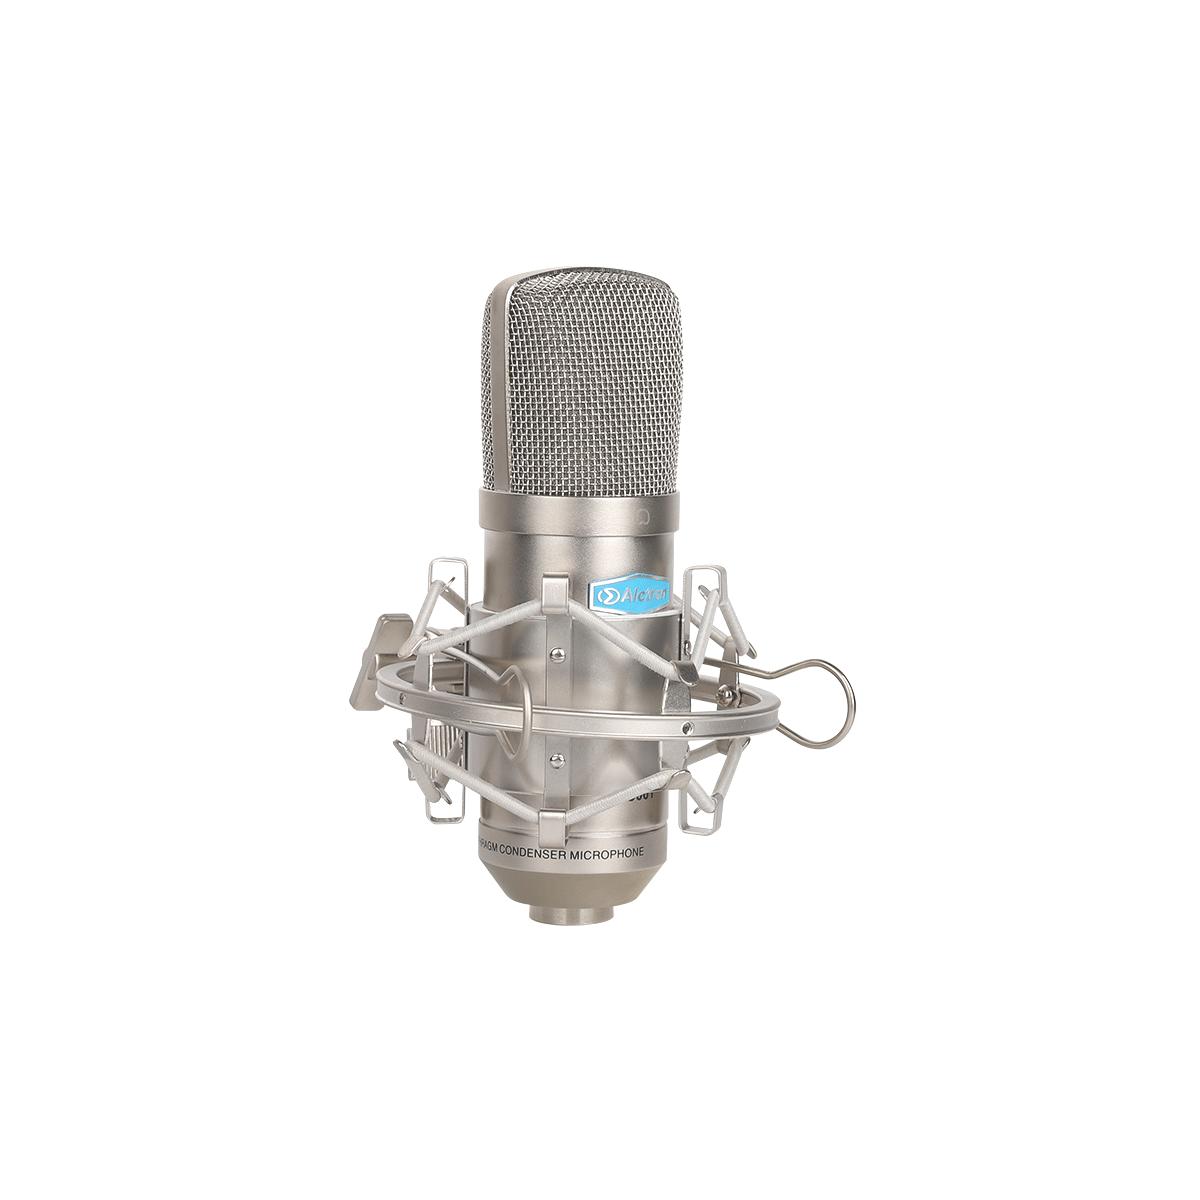 Micros studio - Alctron - MC 001